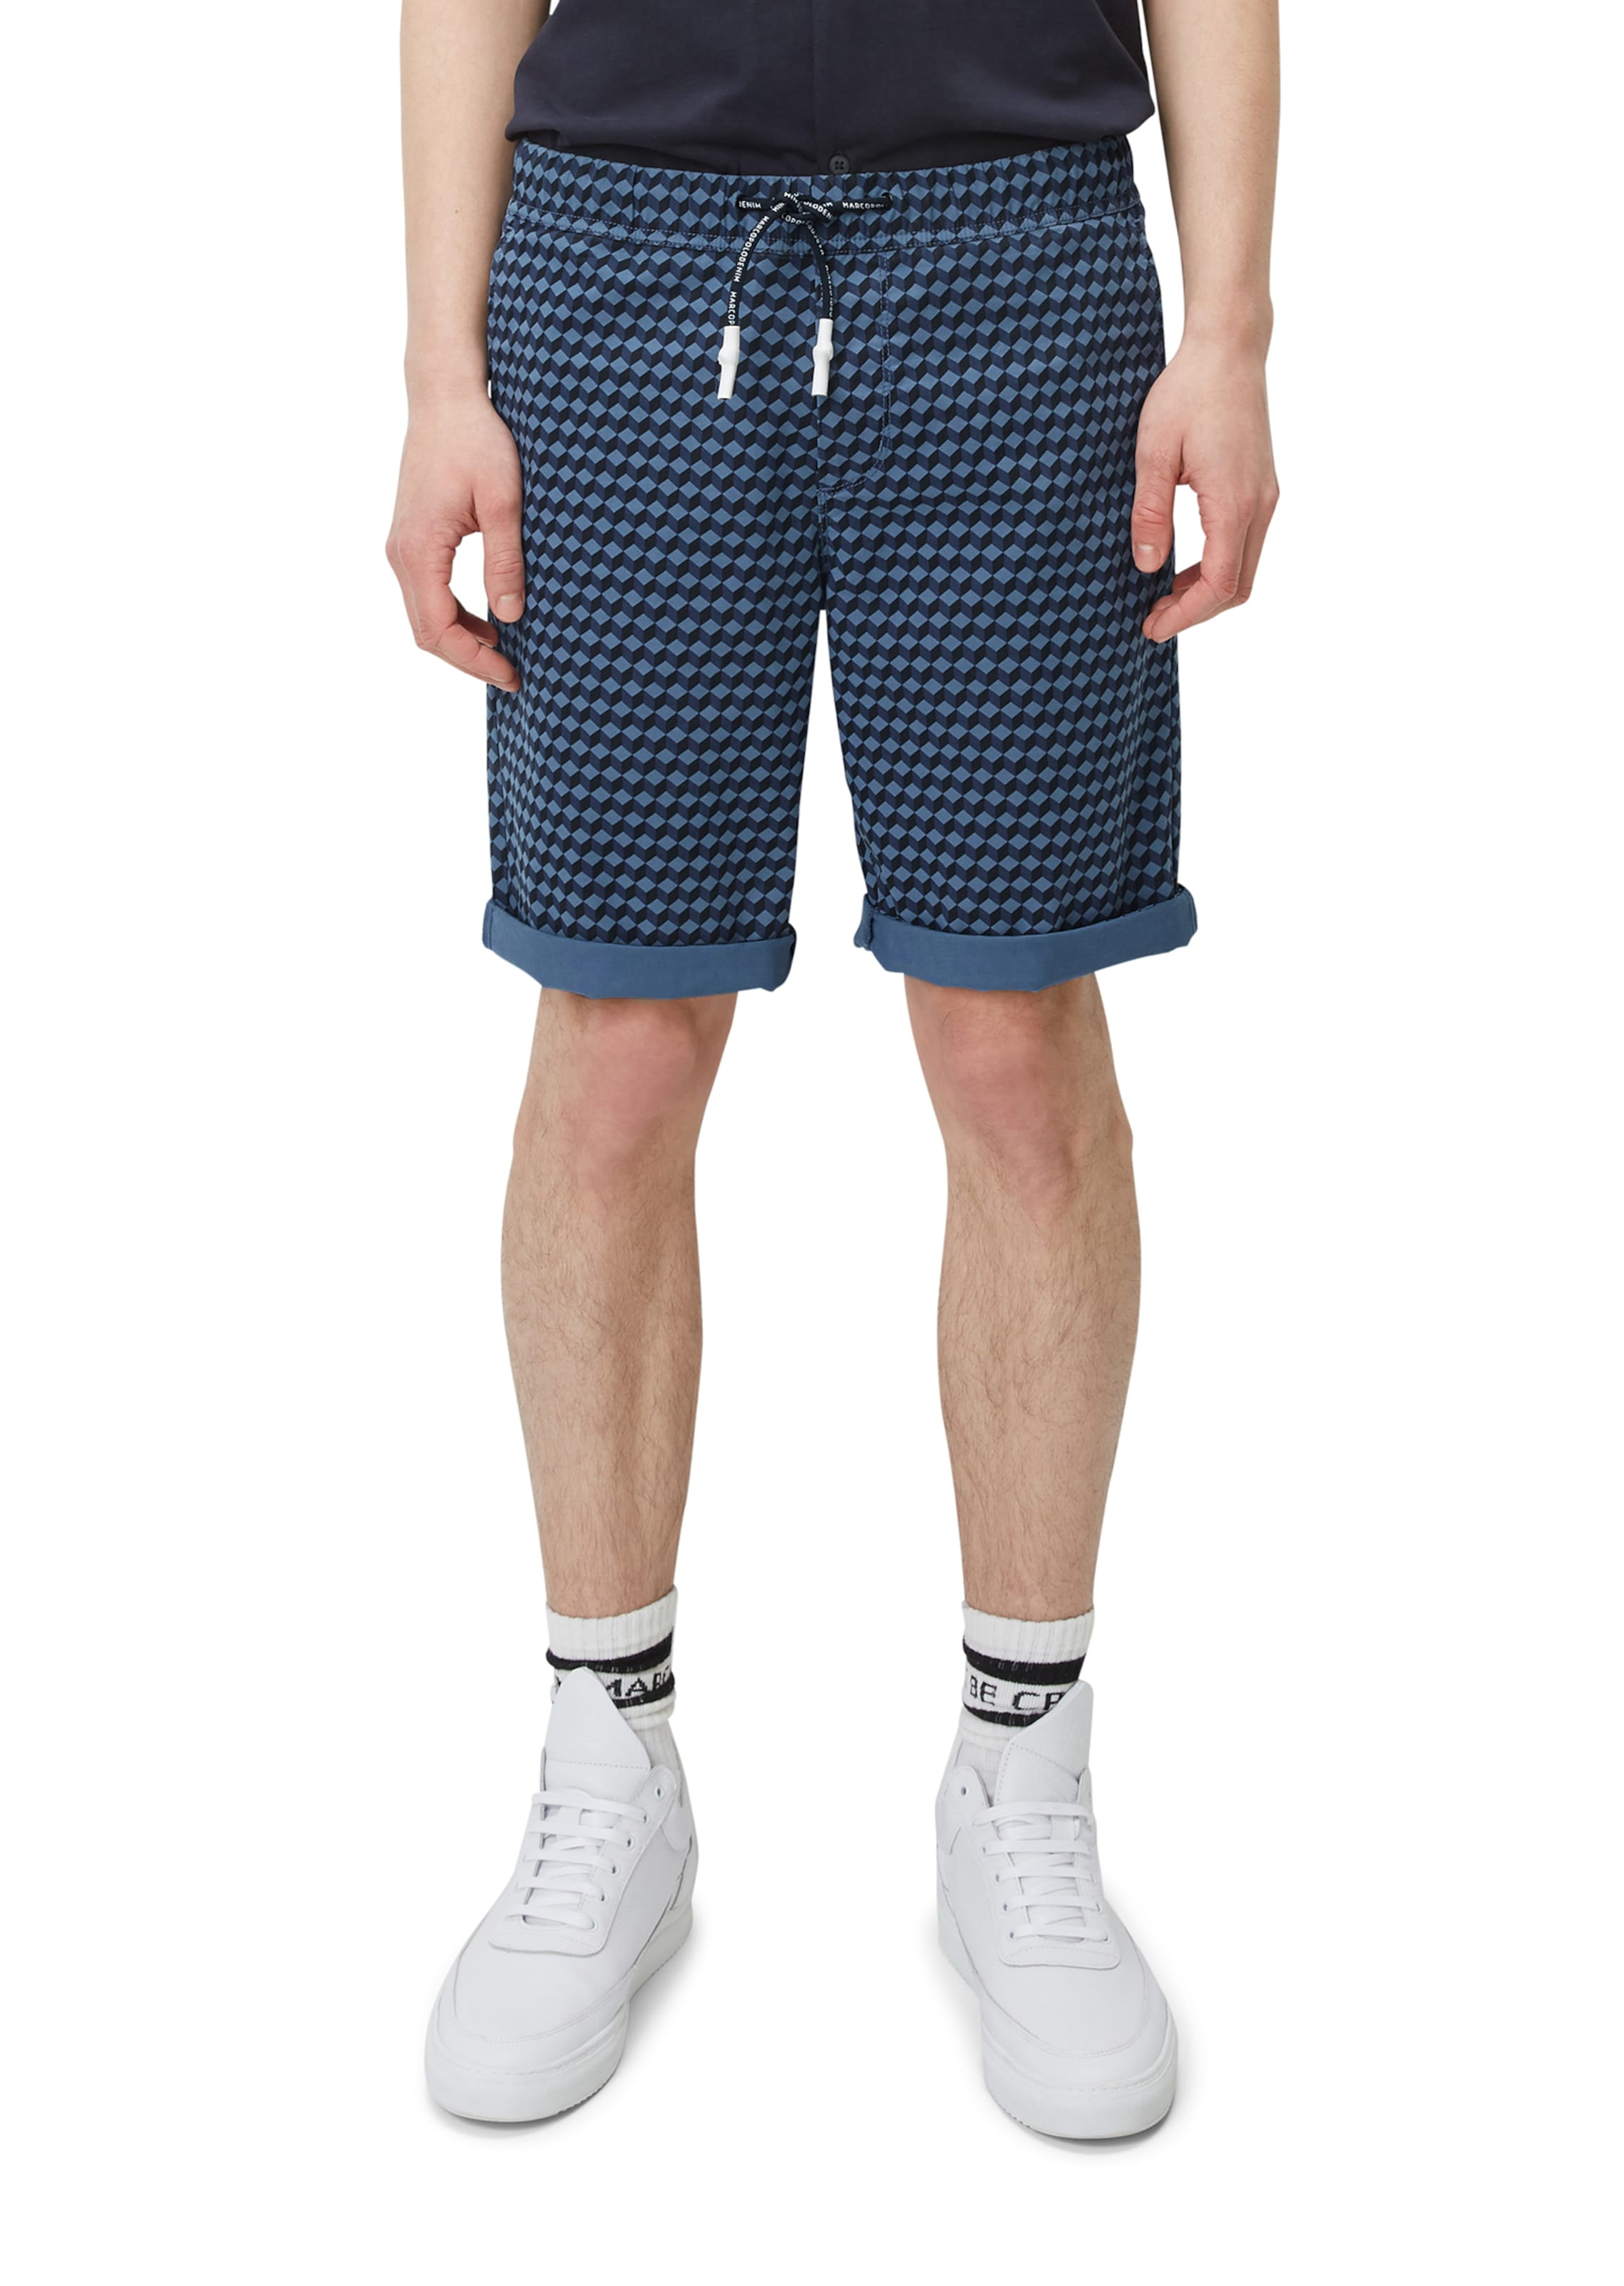 shorts Chino Marc Denim O'polo Mik Regular In BlauNachtblau TFlK1Jc